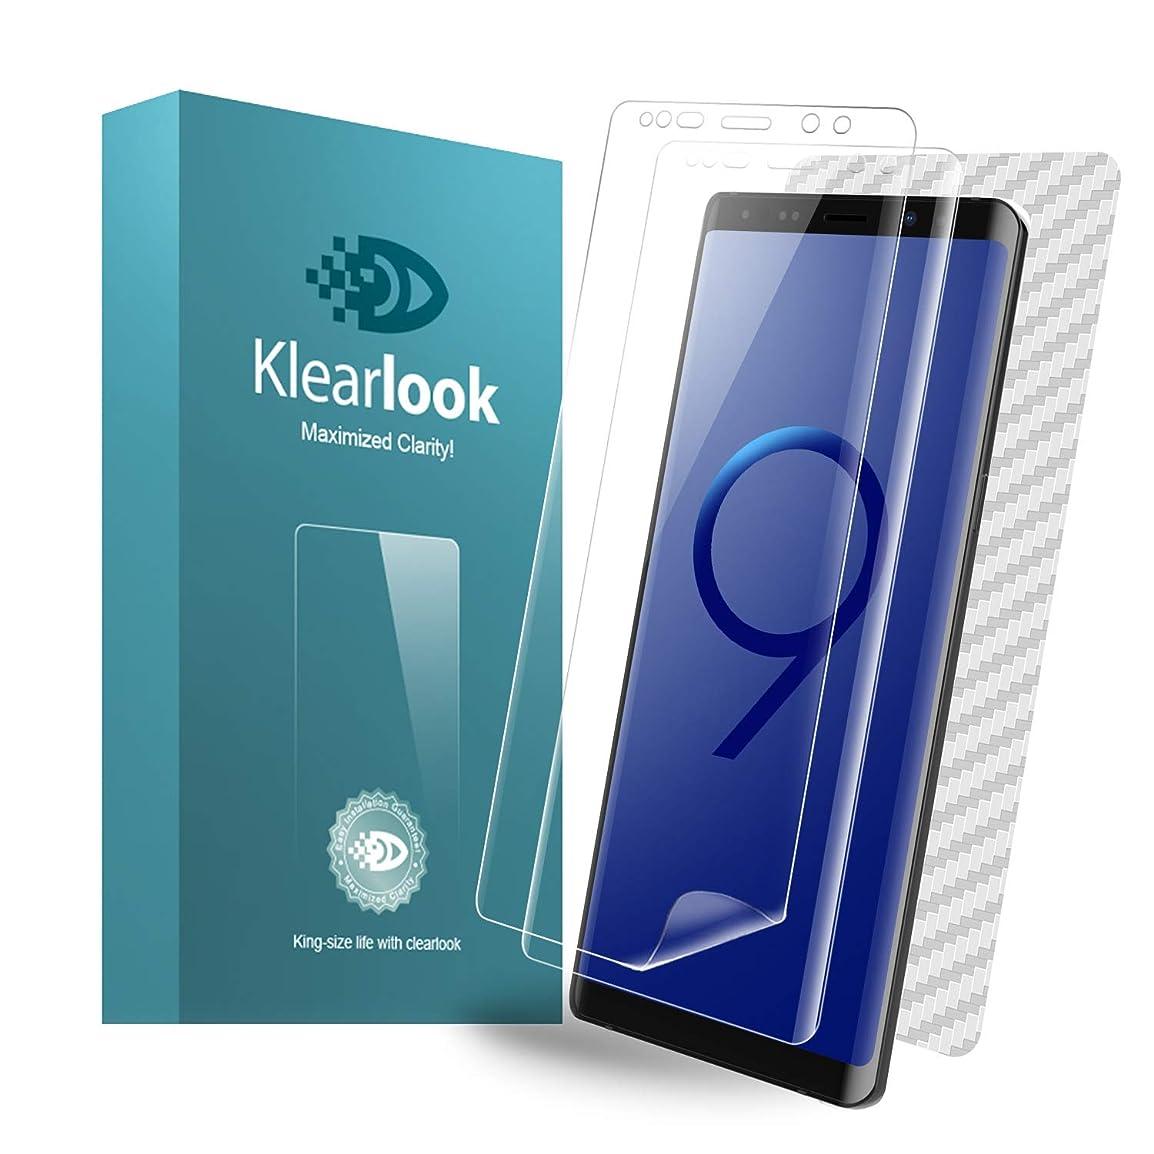 Samsung Galaxy Note 9 全面保護フィルム「99%透過率」フルサイズ 貼り直し可 気泡ゼロ 厚さ0.16mm 良いタッチ感度 「 液晶画面保護フィルム2枚+ 背面保護フィルム1枚」